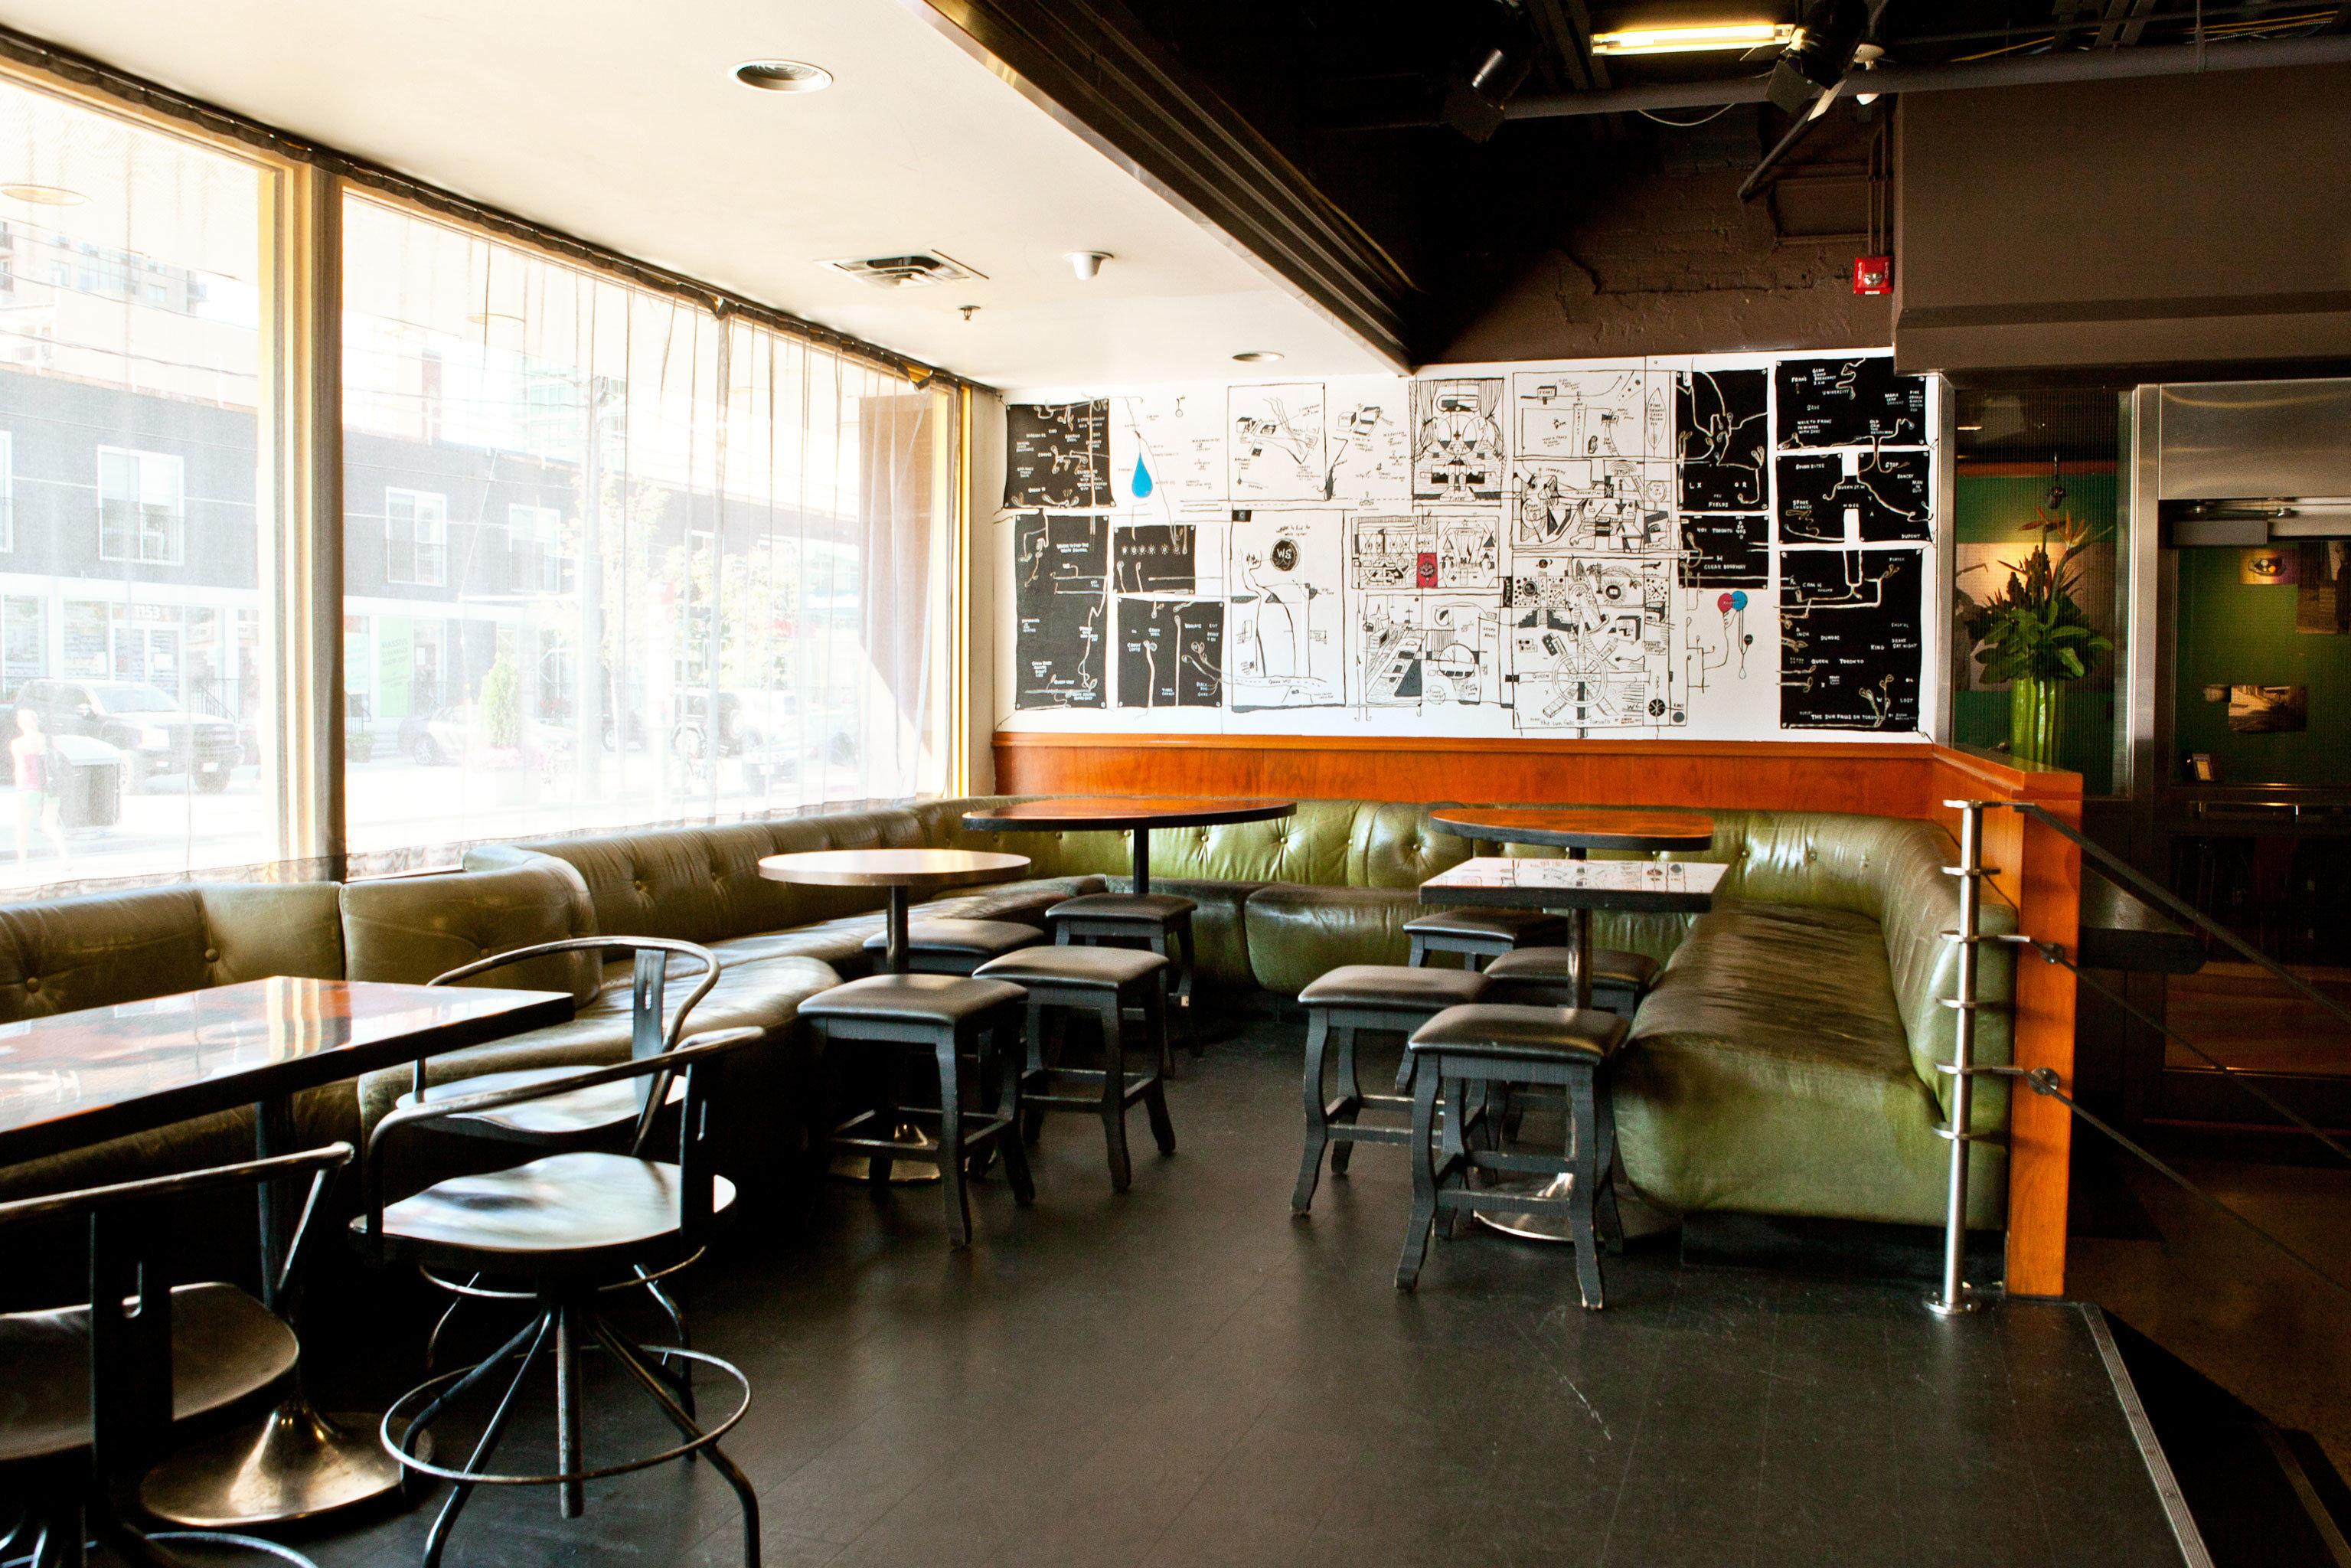 Boutique City Dining Drink Eat Hip Modern building restaurant classroom